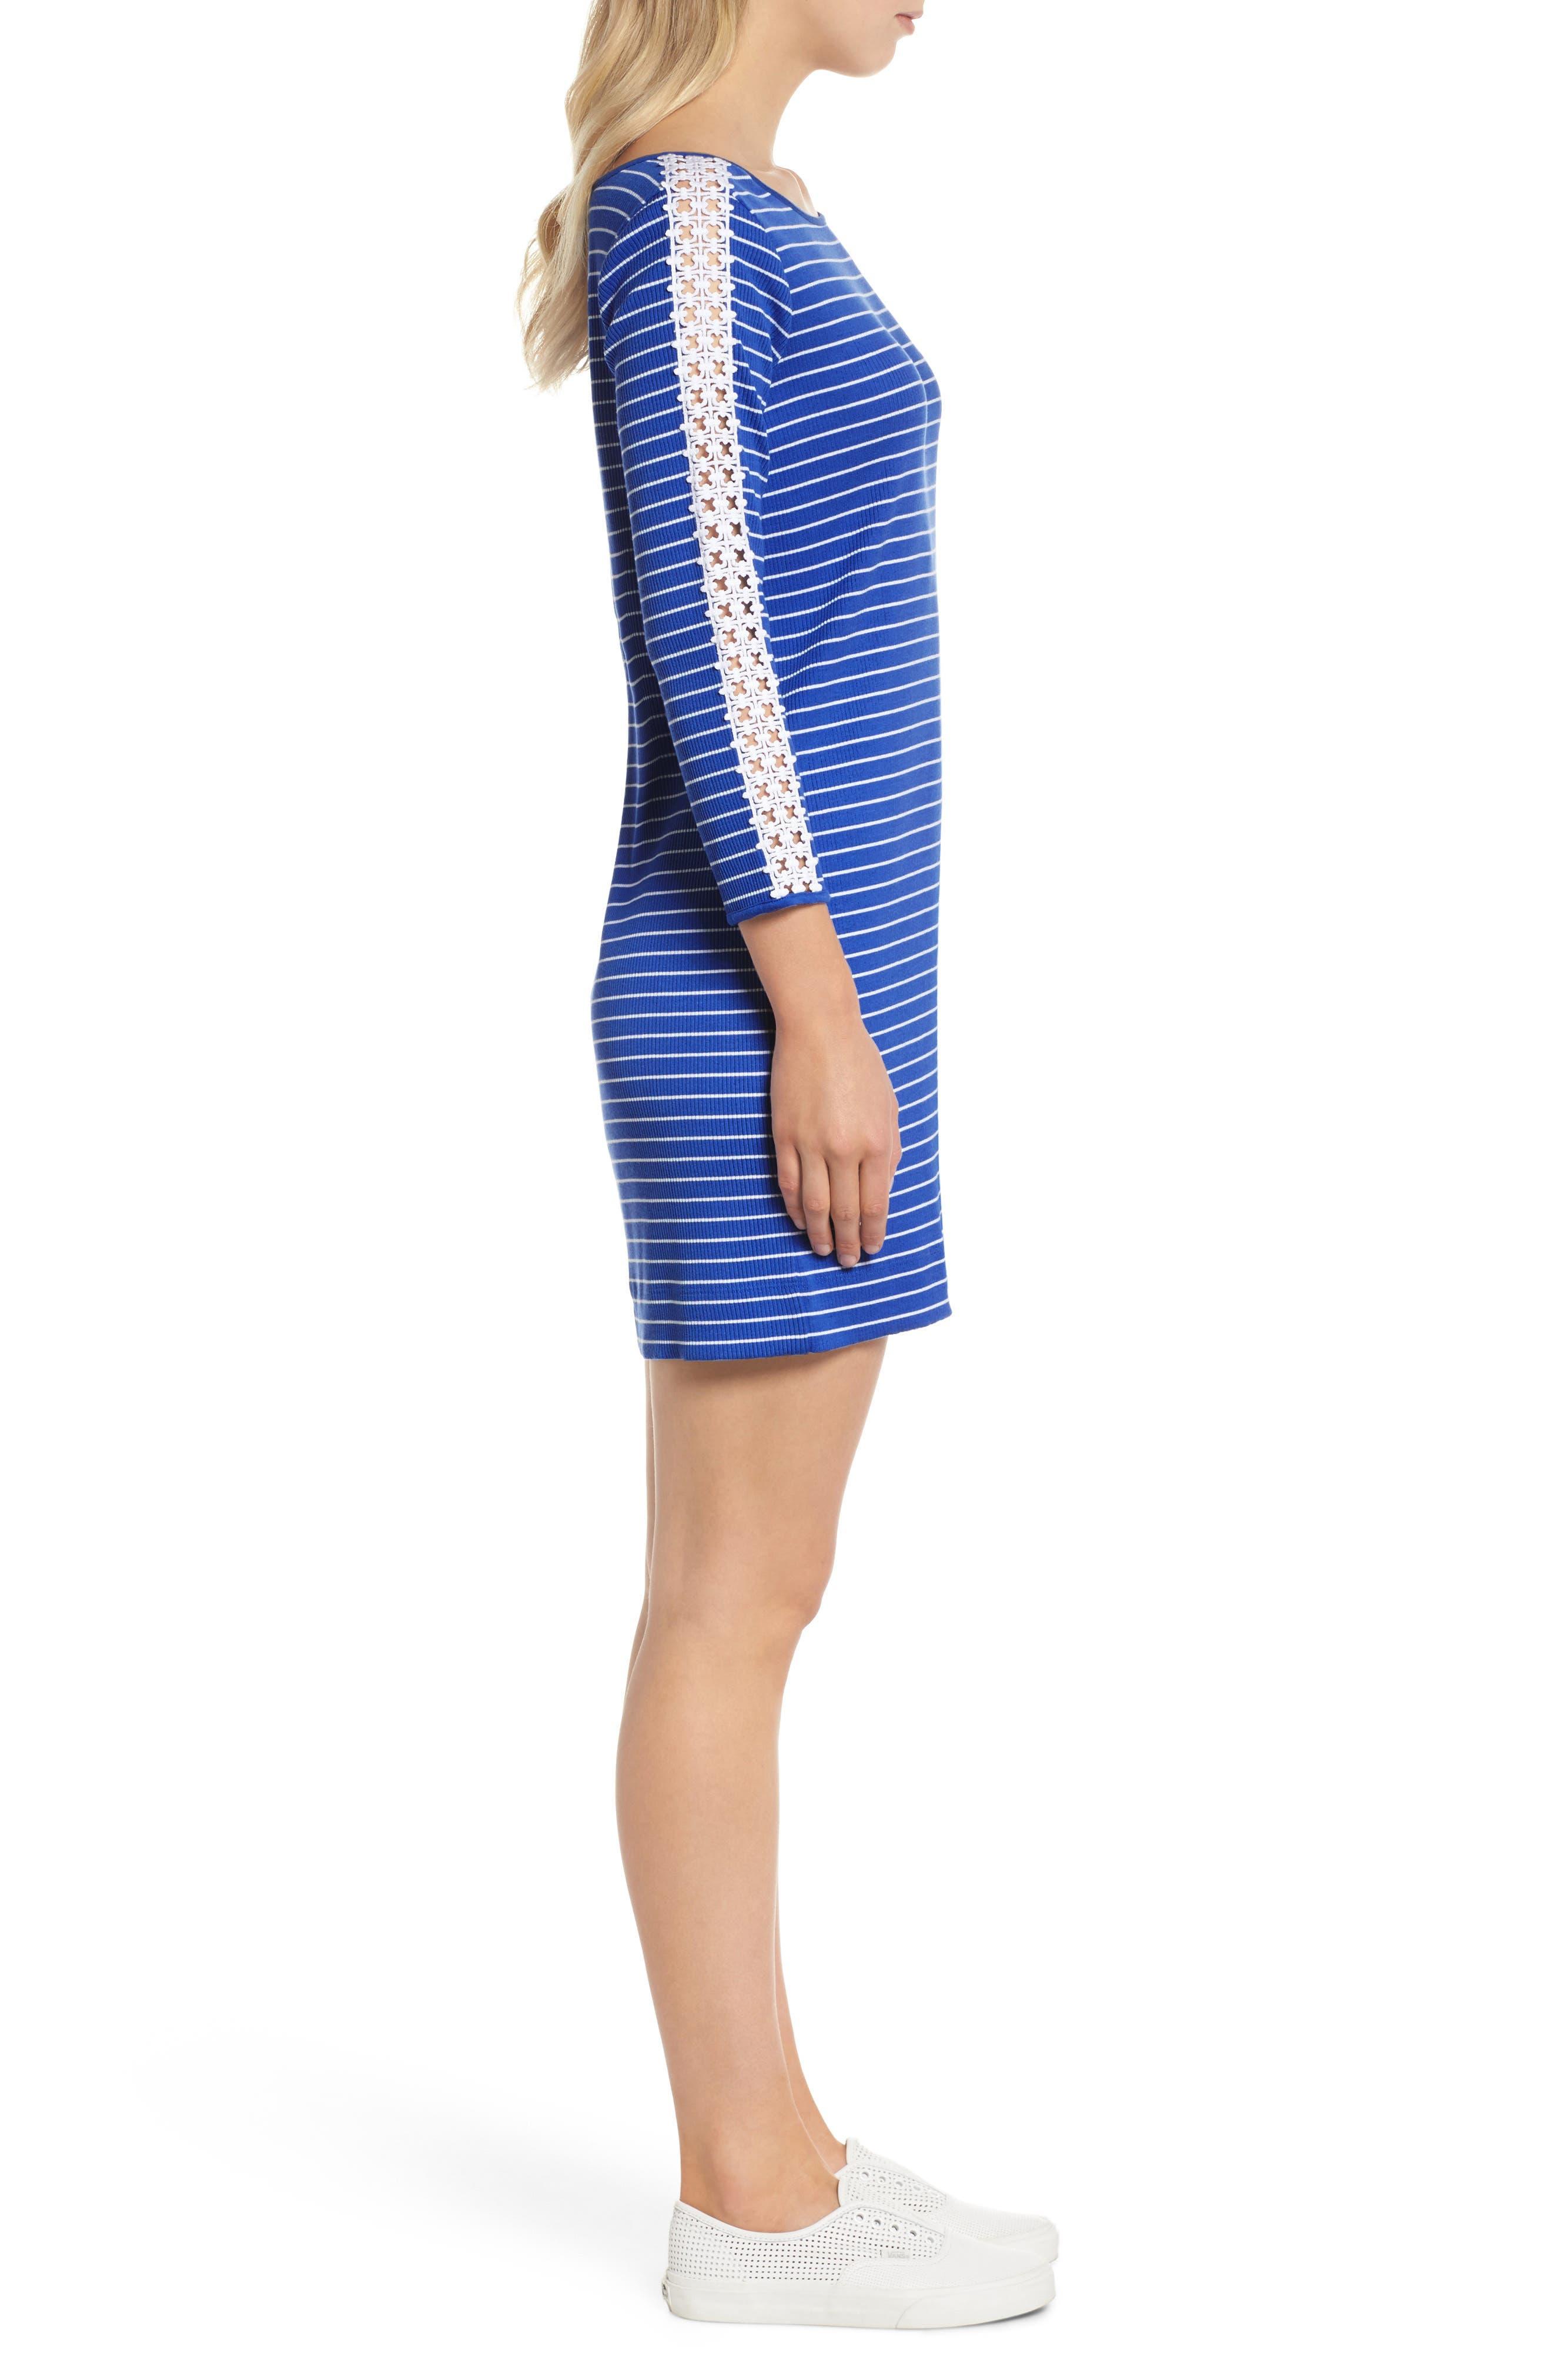 Marlowe Shift Dress,                             Alternate thumbnail 3, color,                             Beckon Blue Breeze Stripe